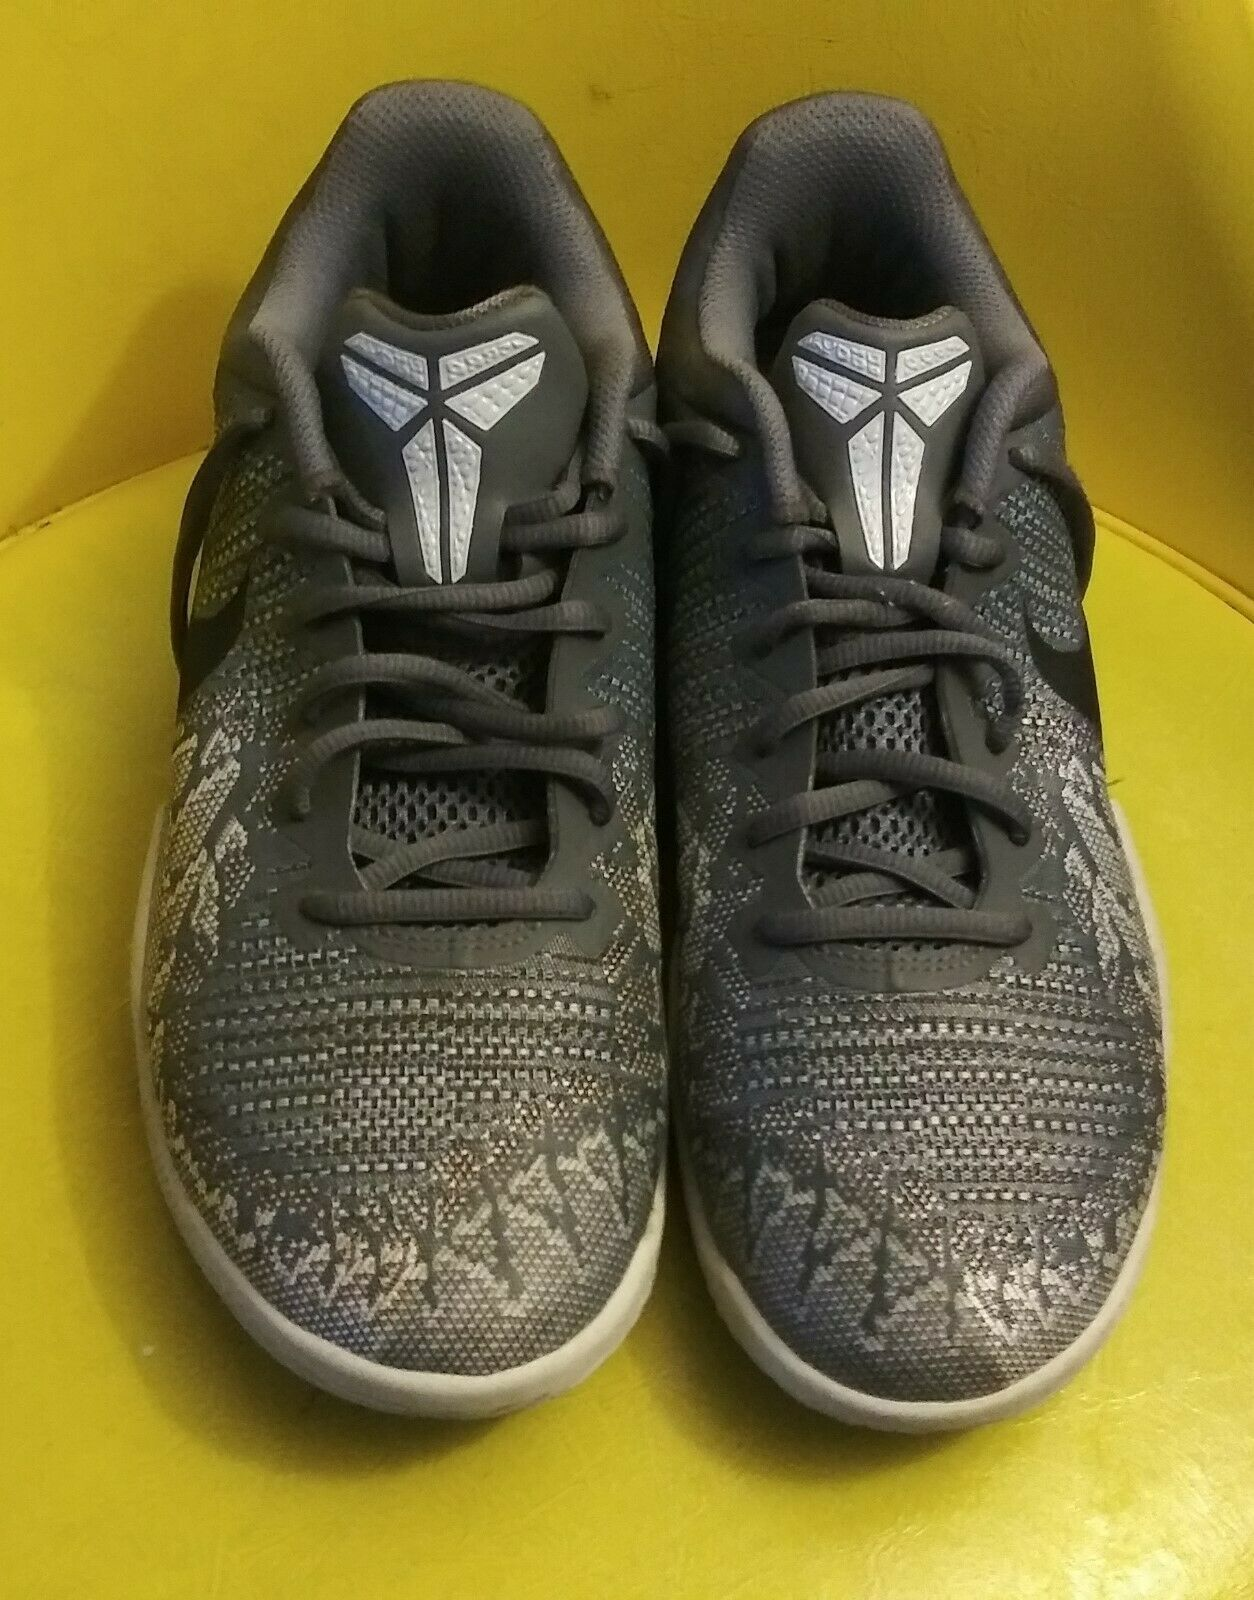 NIKE Kobe Mamba Rage Basketball Shoe 908972-011 Size US 8 / EUR 41